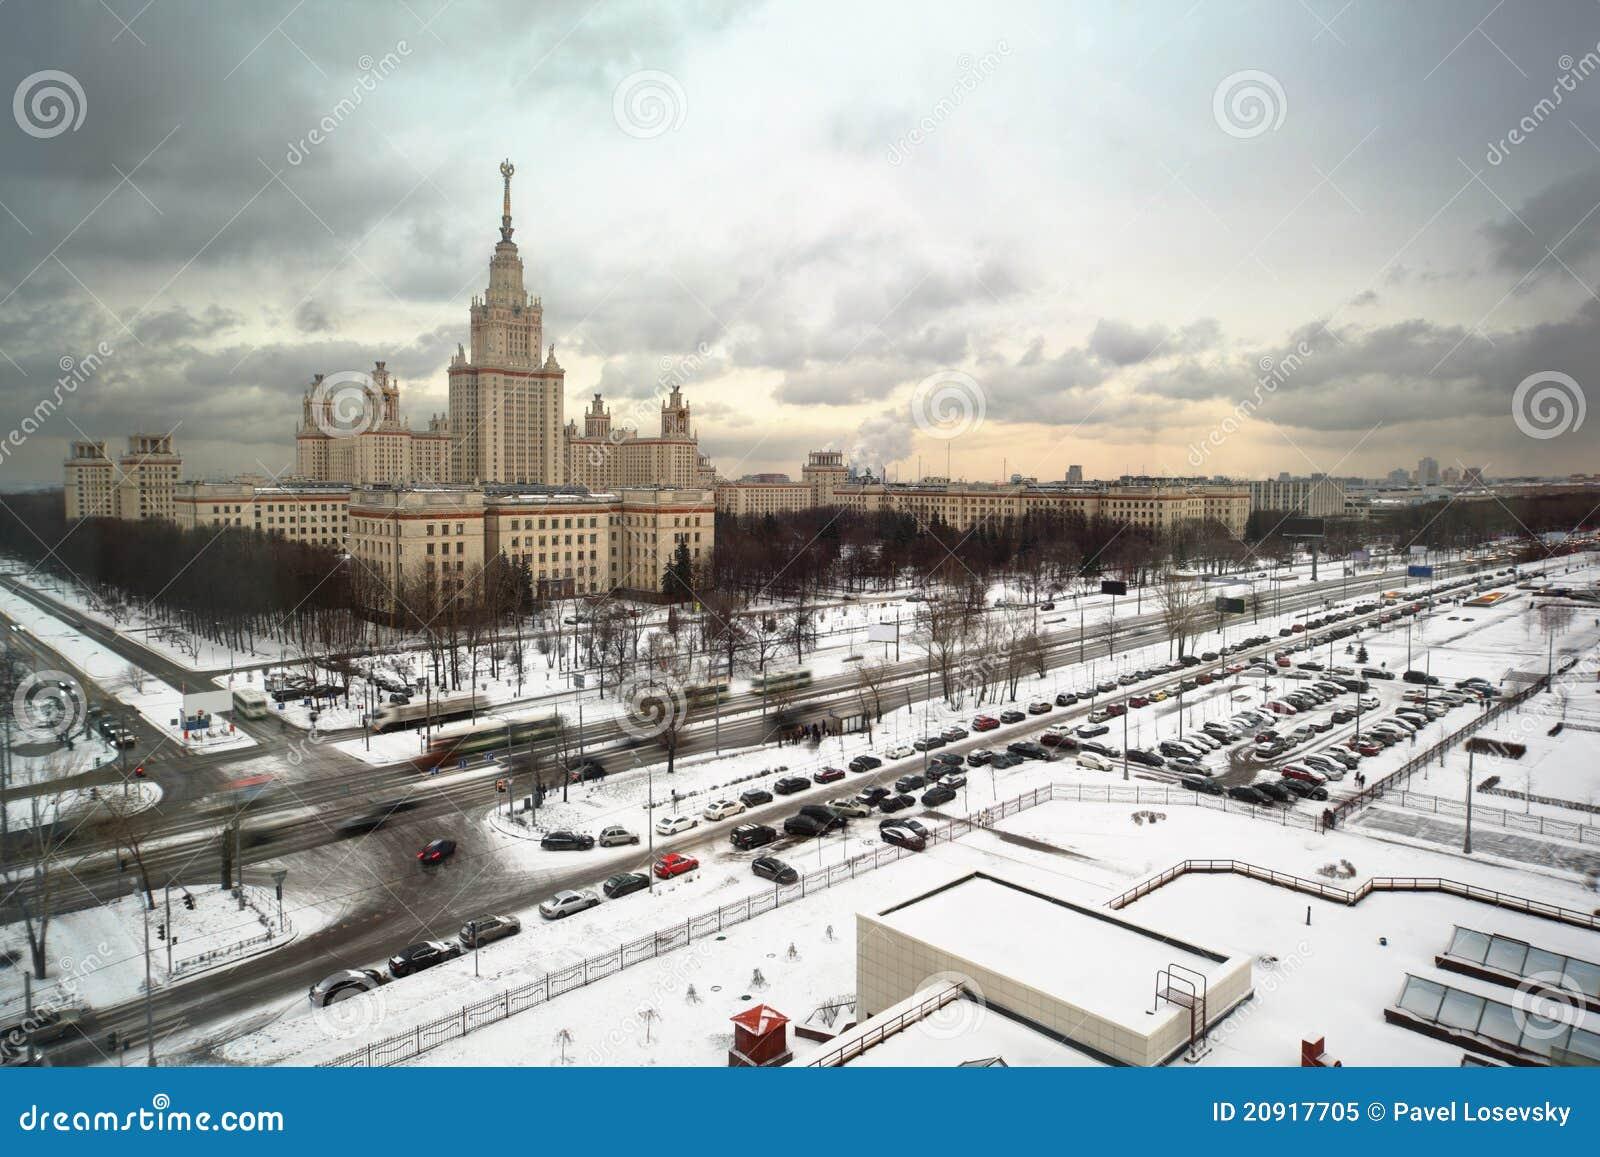 Main Russian University And 72